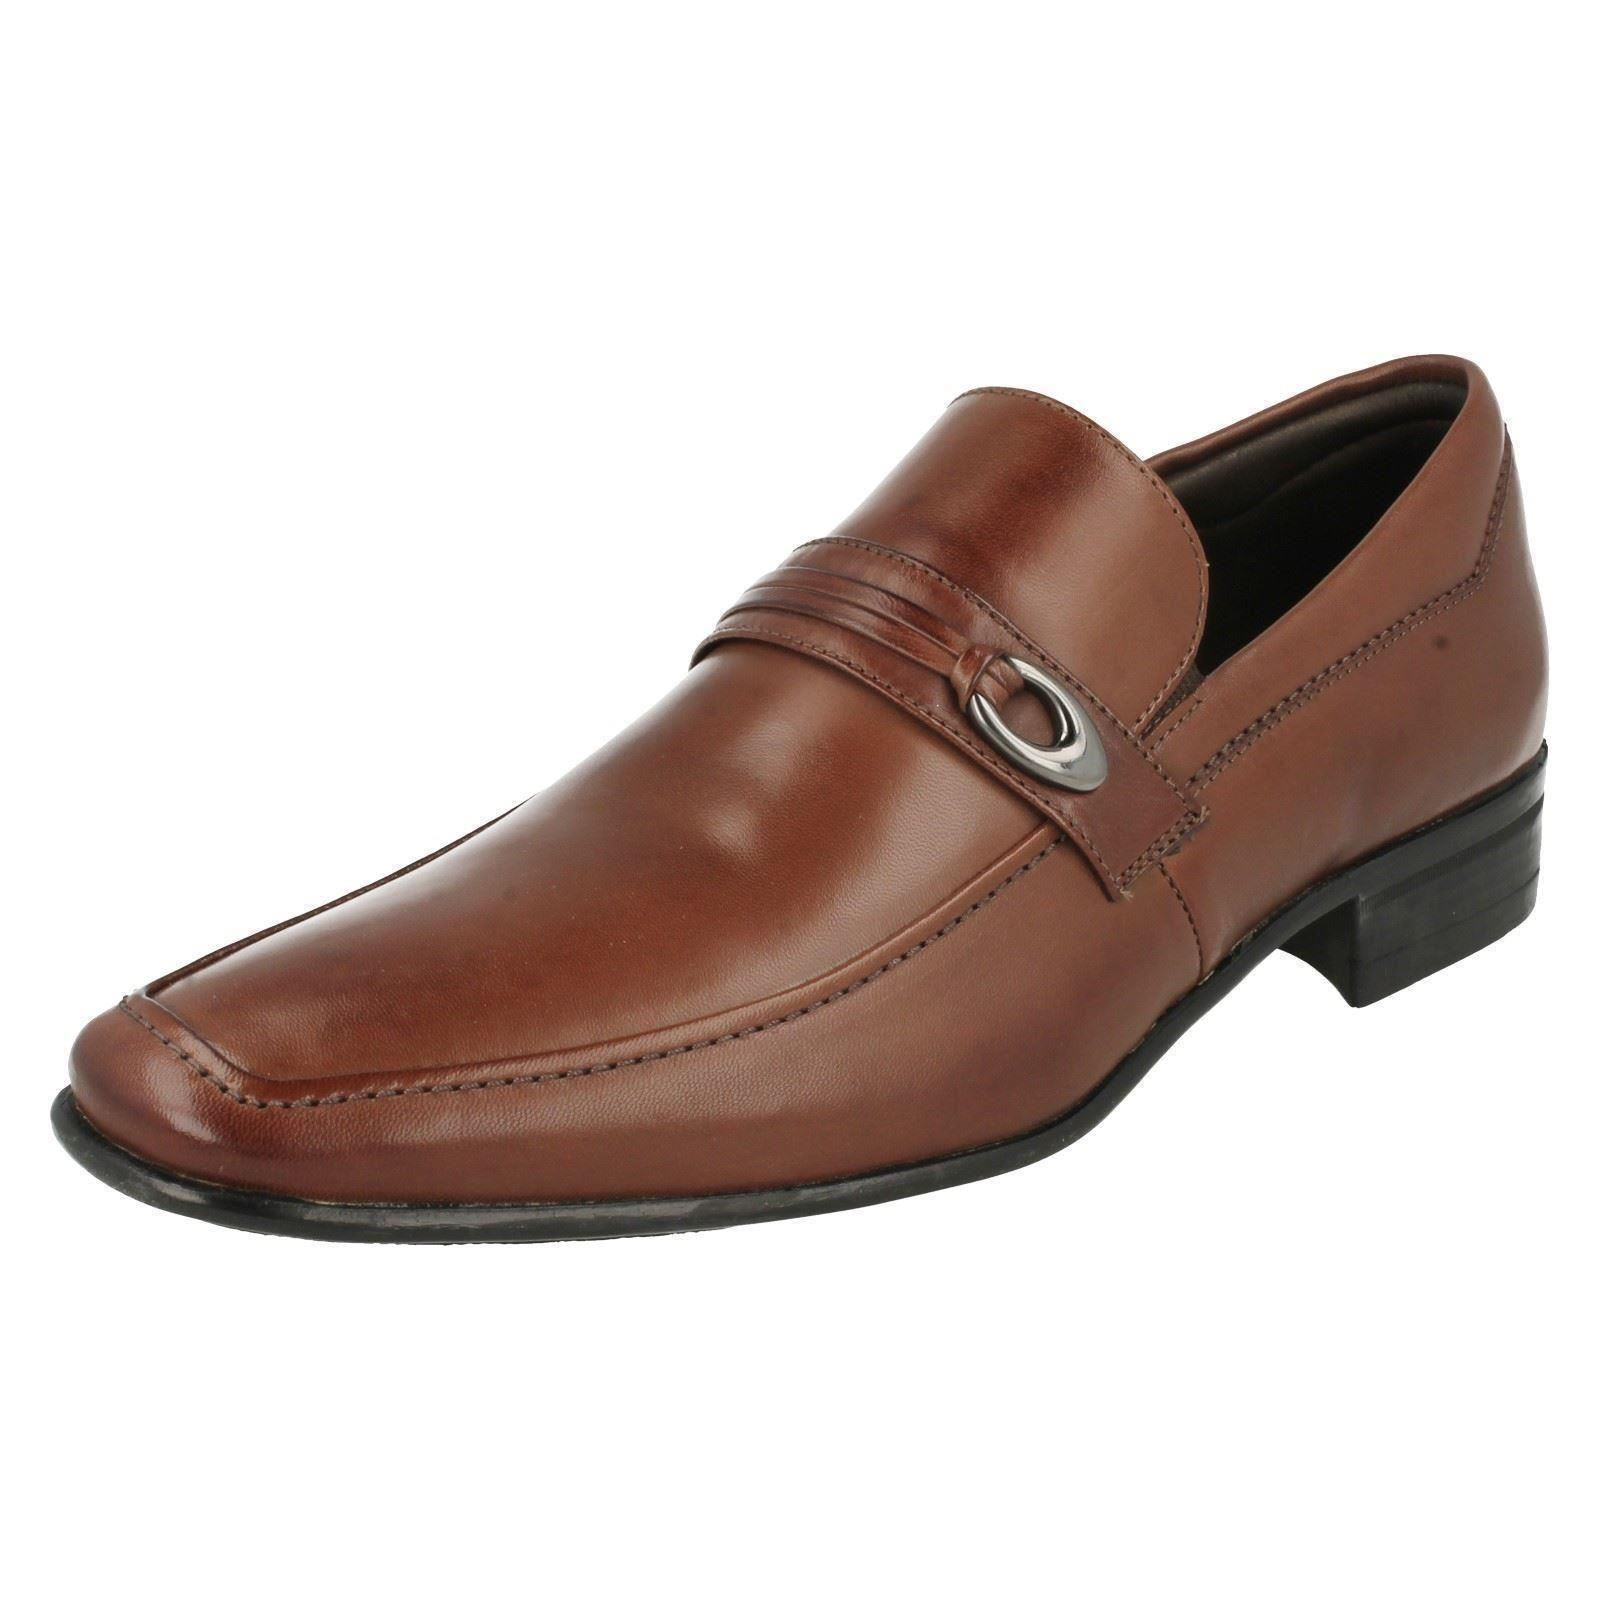 Mens The Anatomic Prime Casual Shoes The Mens Style - Goiania ad6a5e